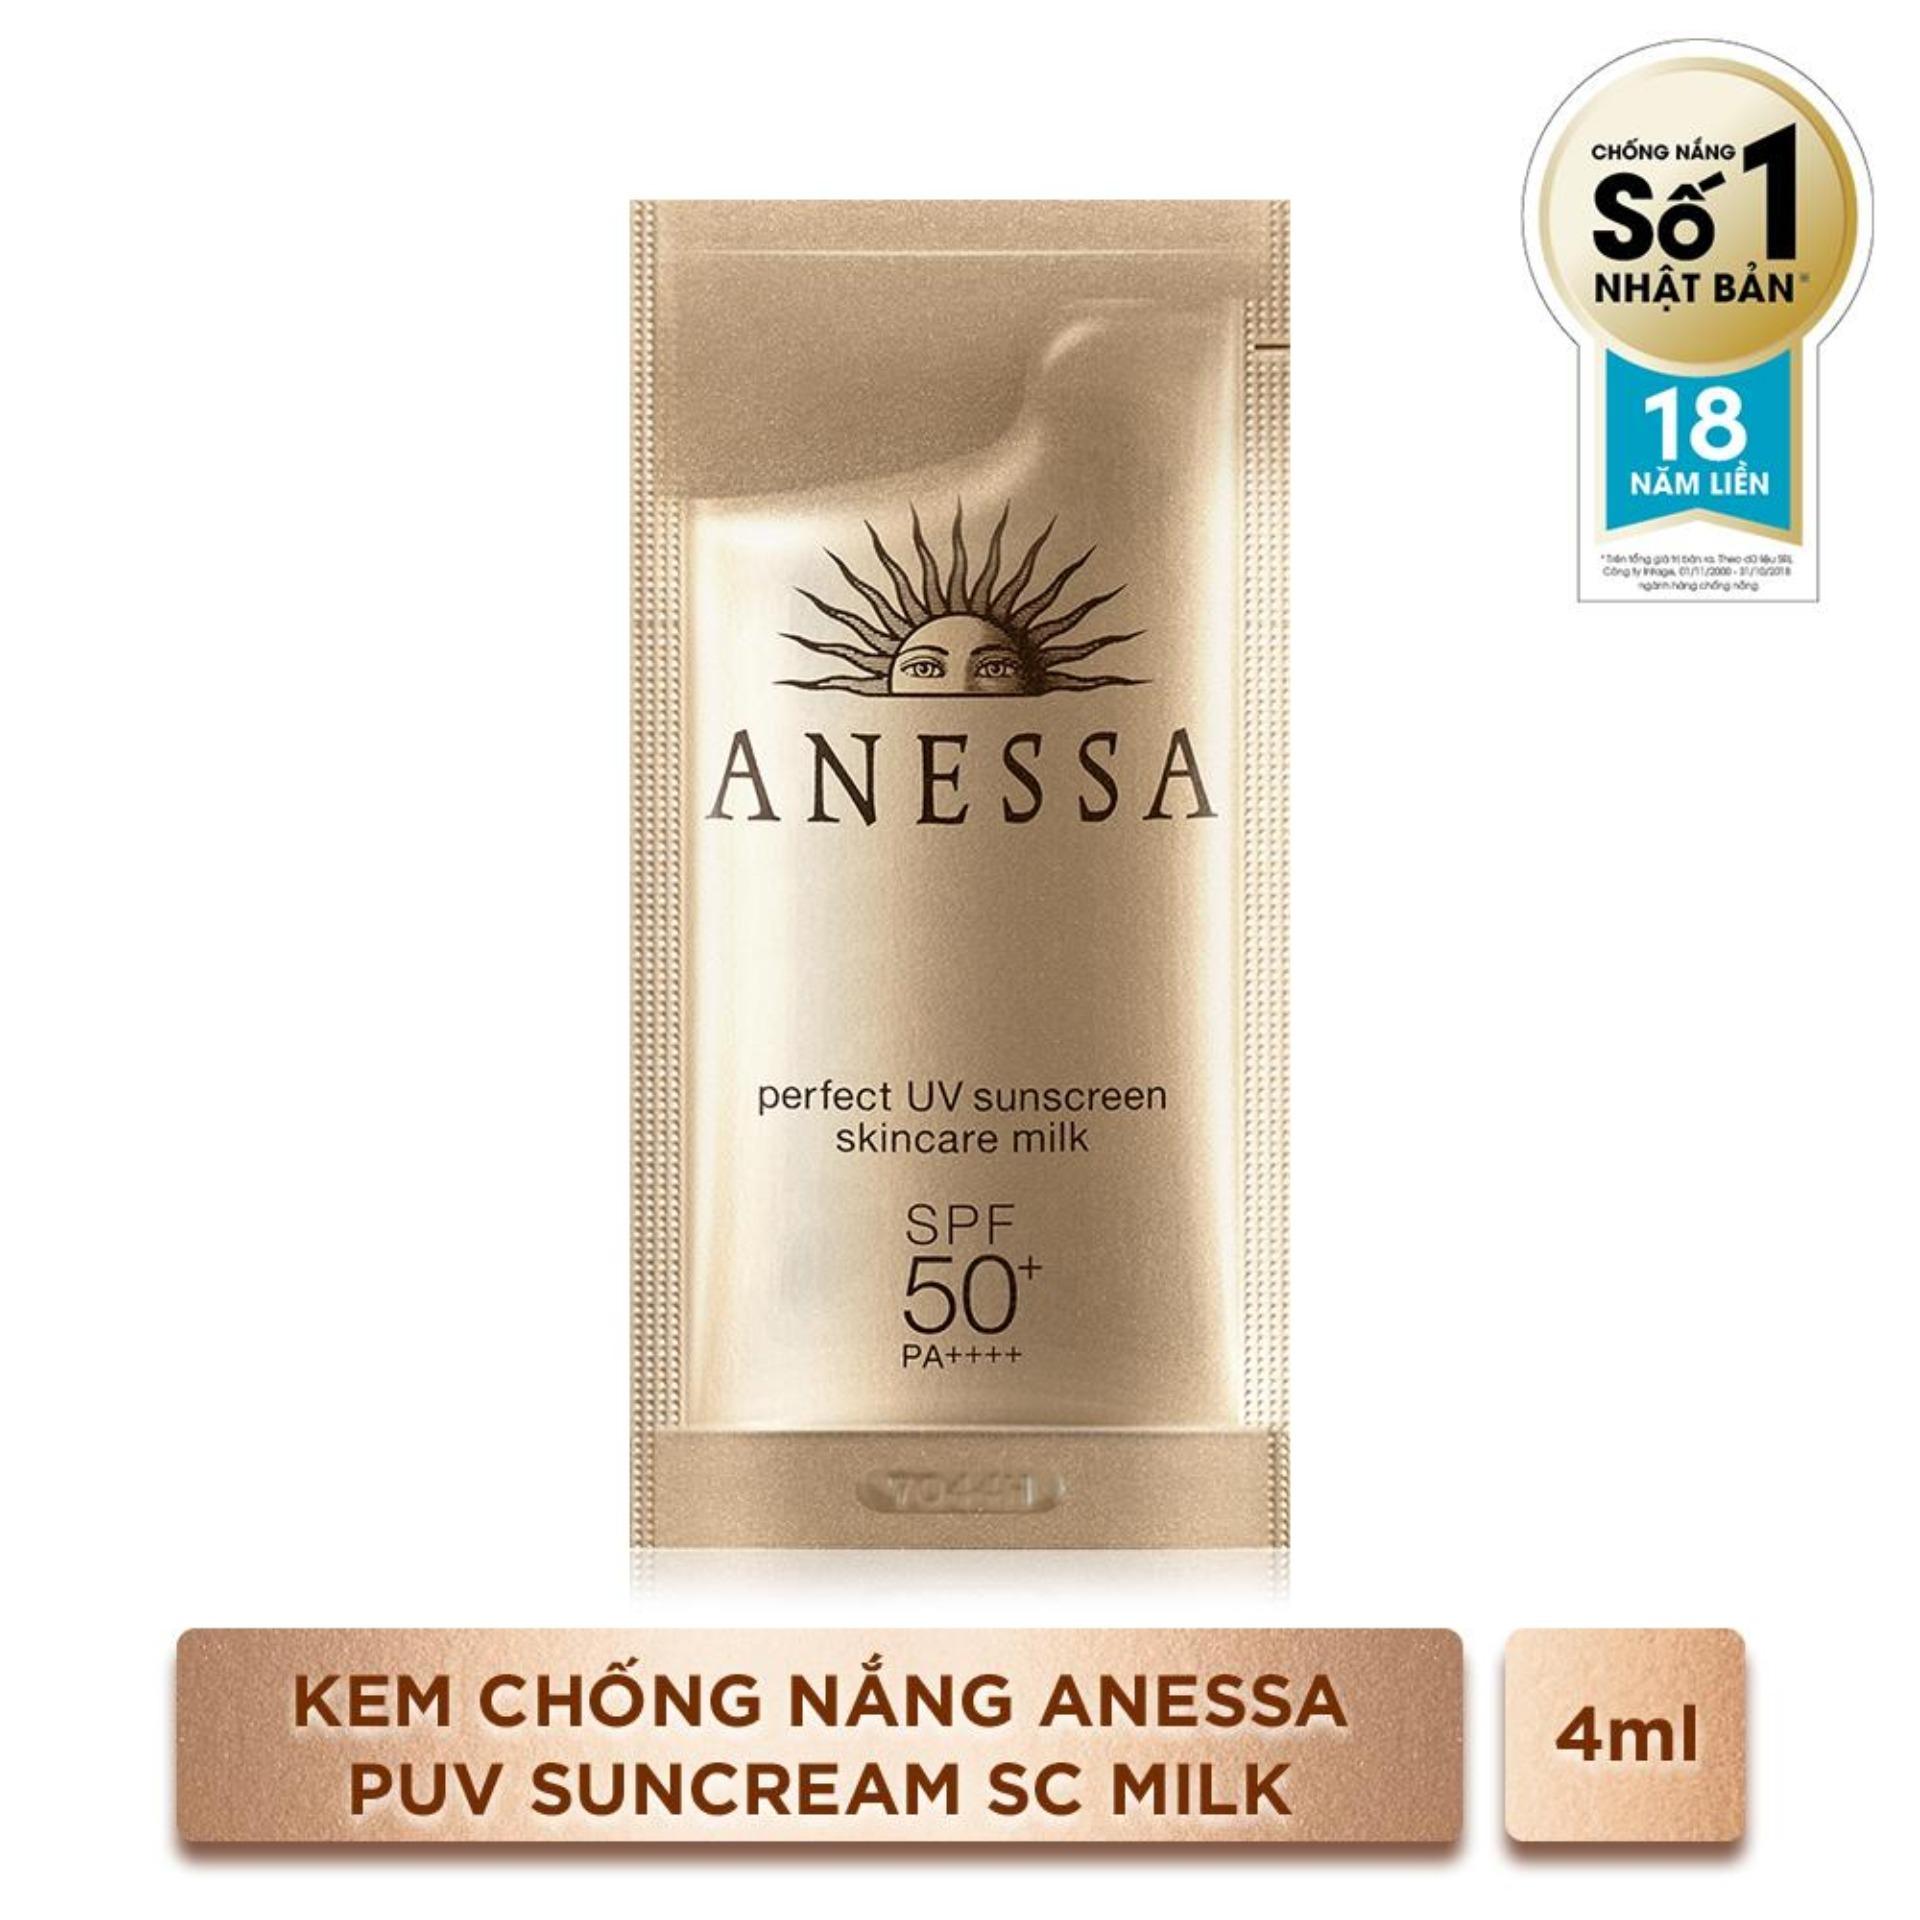 Kem Chống Nắng Anessa Perfect UV Sunscreen Skincare Milk 4ml